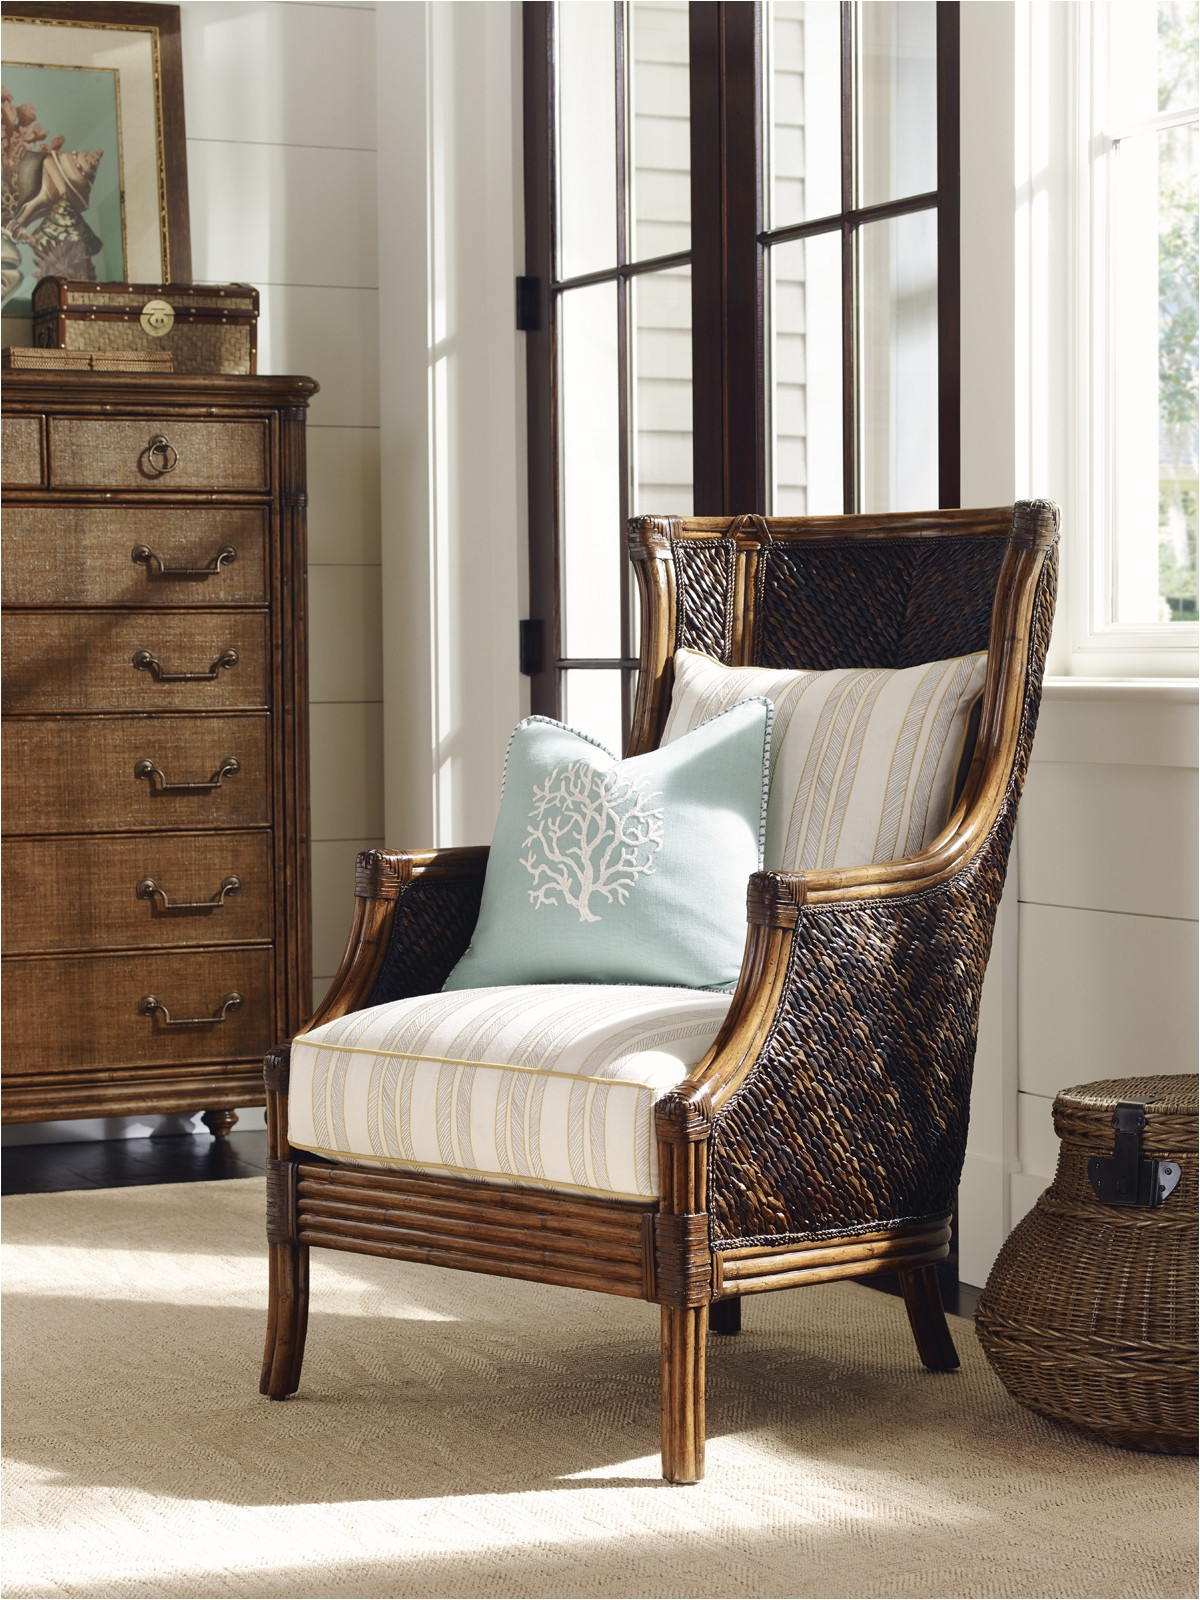 Walnut Creek Furniture Store tommy Bahama Outdoor Furniture Luxury